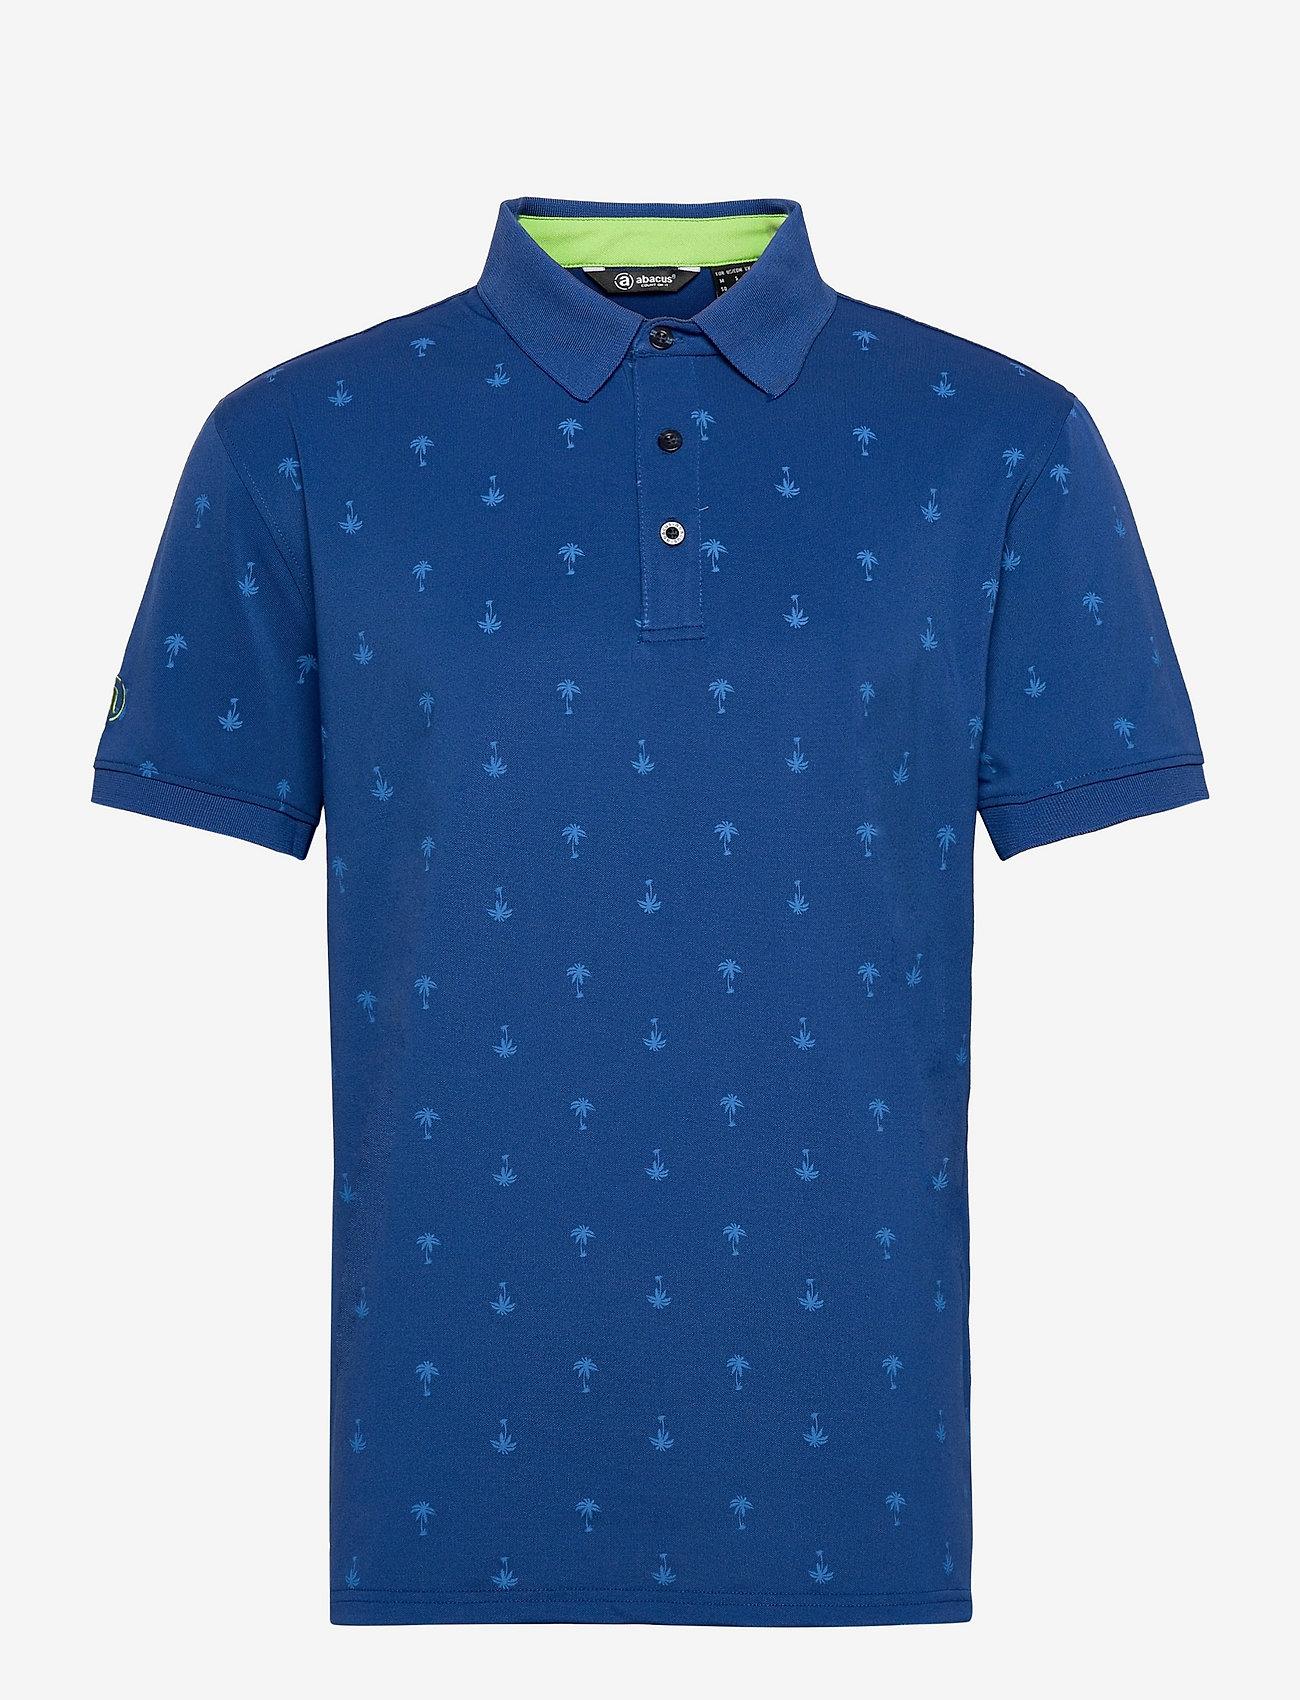 Abacus - Hankley polo - polo's - atlantic blue - 0